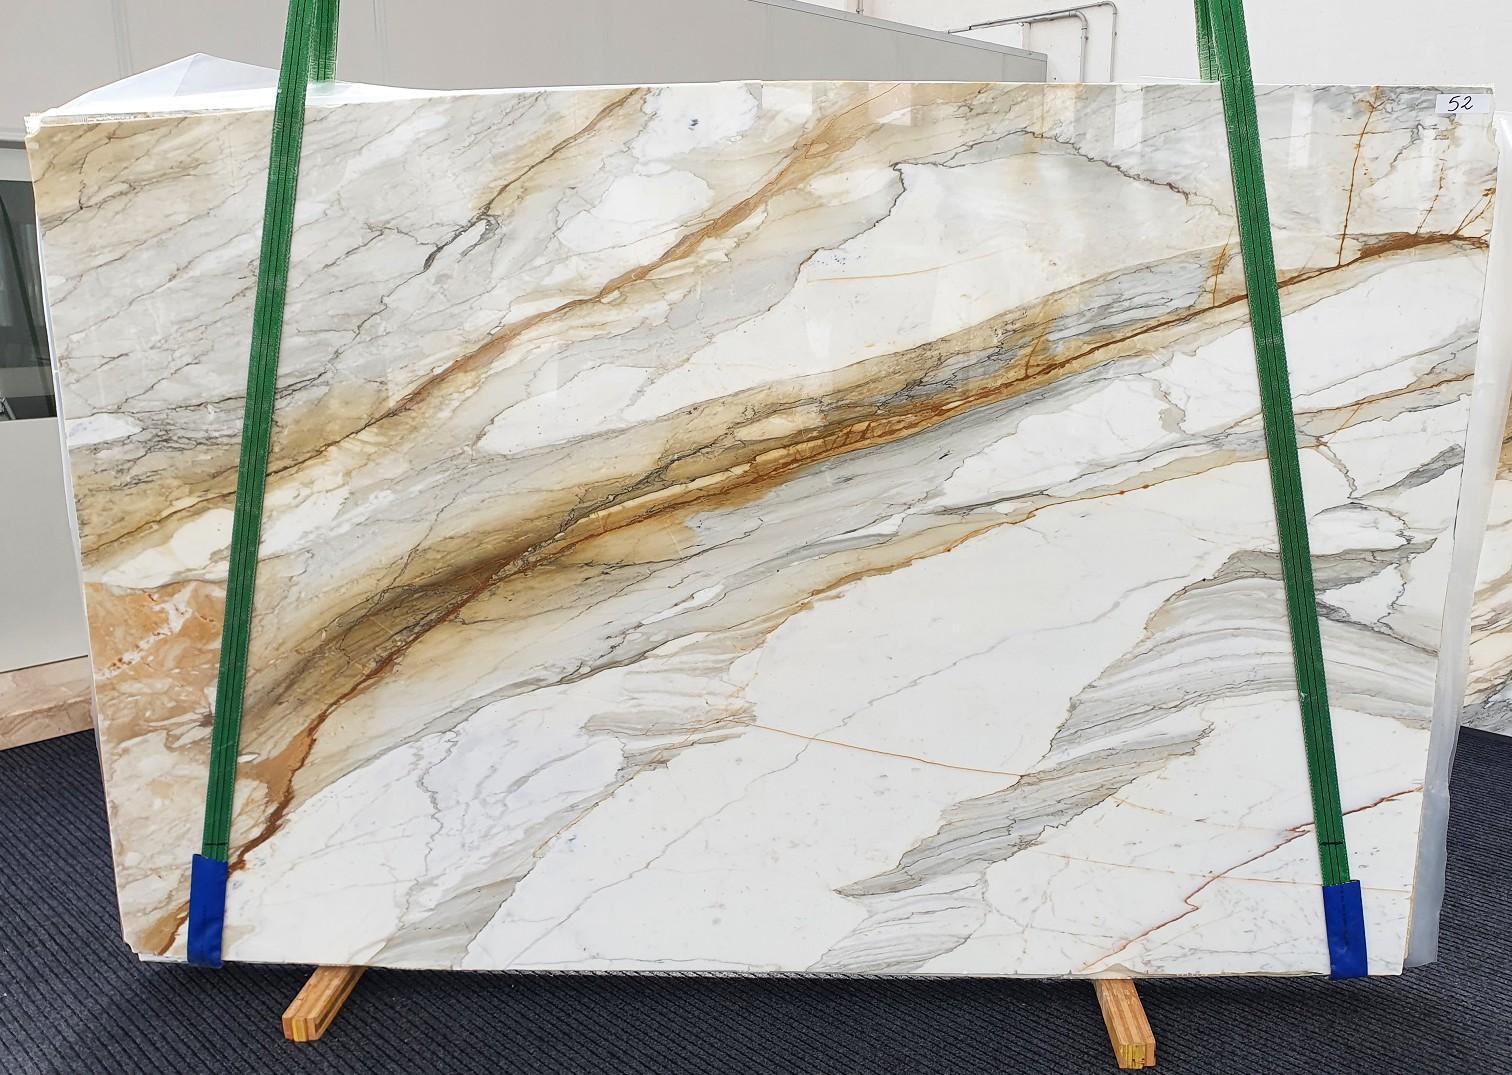 CALACATTA MACCHIAVECCHIA polierte Unmaßplatten 1354 aus Natur Marmor , Slab #52: Lieferung Veneto, Italien